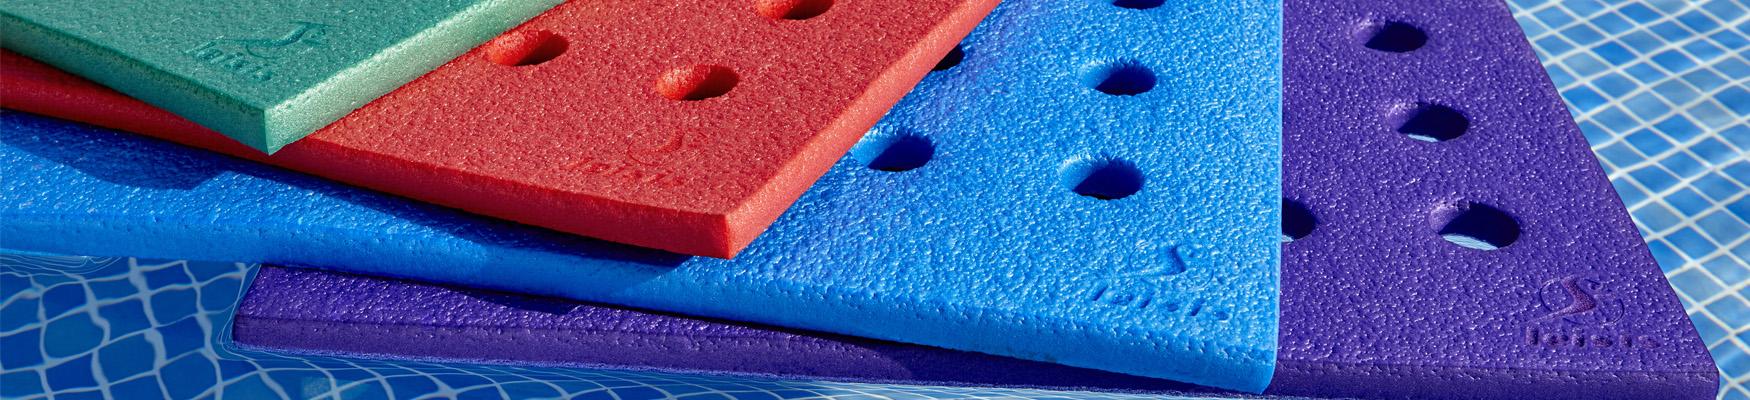 Material piscina y nataci n tienda de nataci n online leisis - Material para piscinas ...